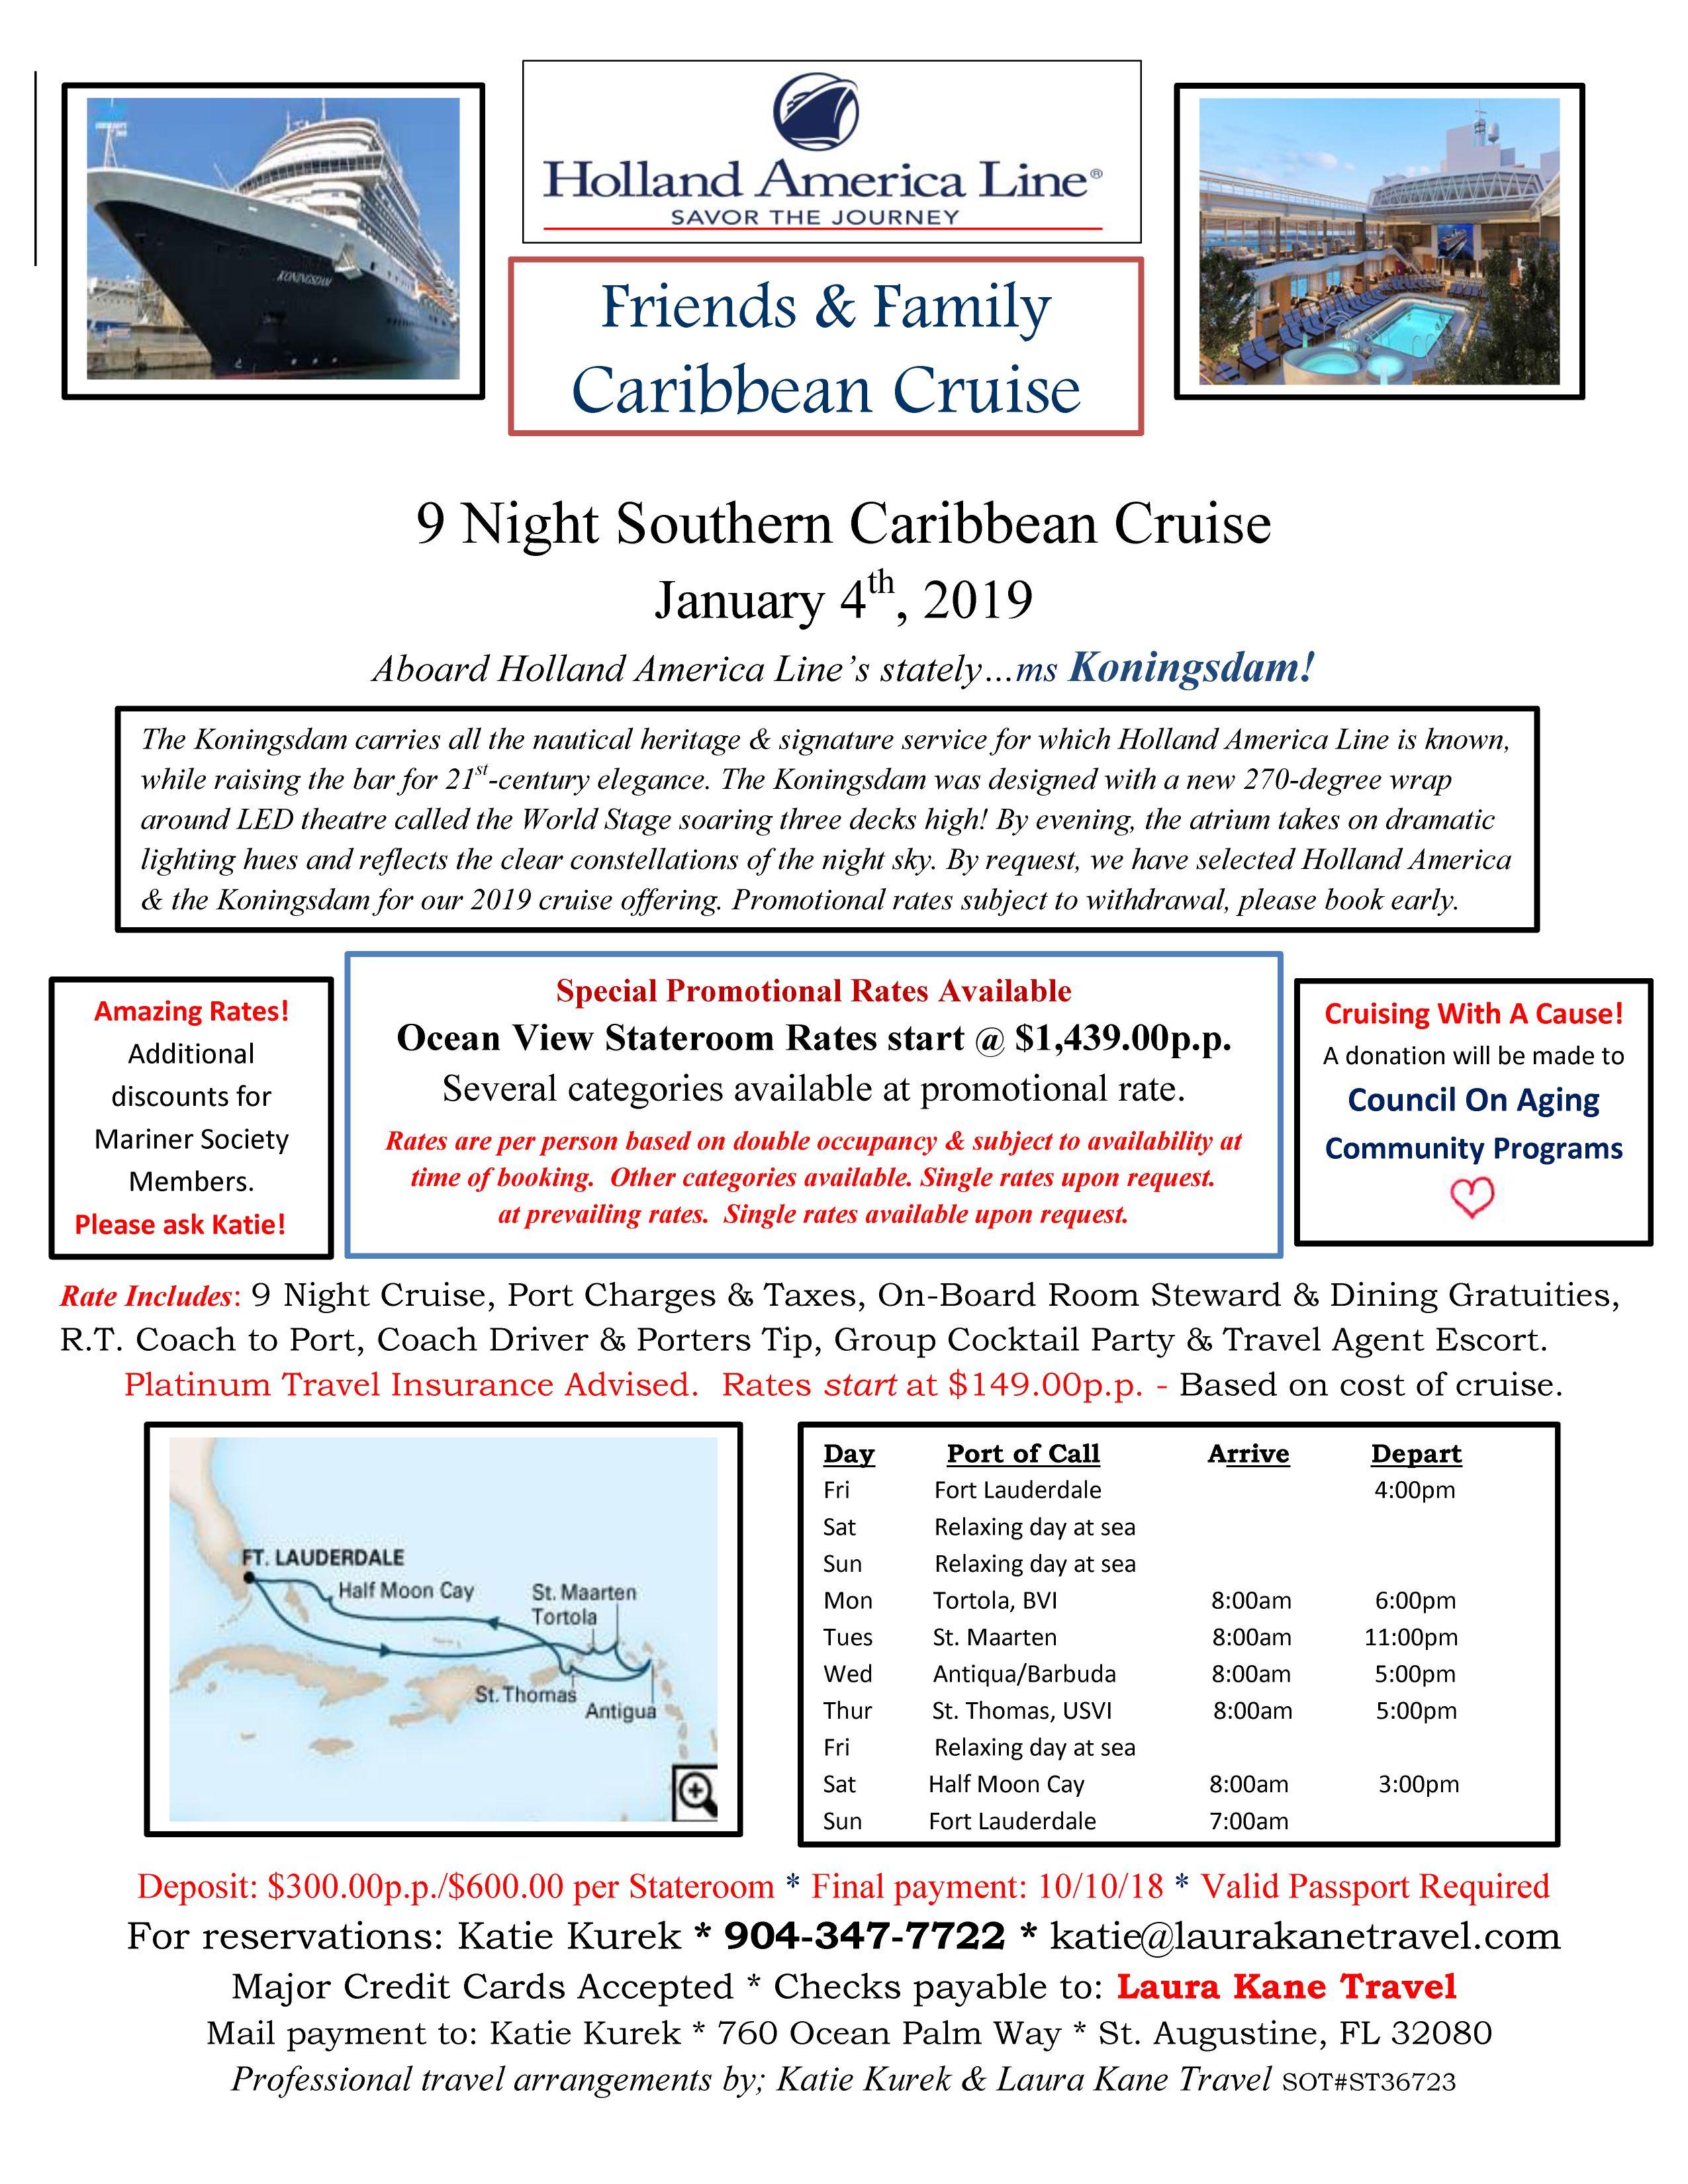 Cruise to benefit COA